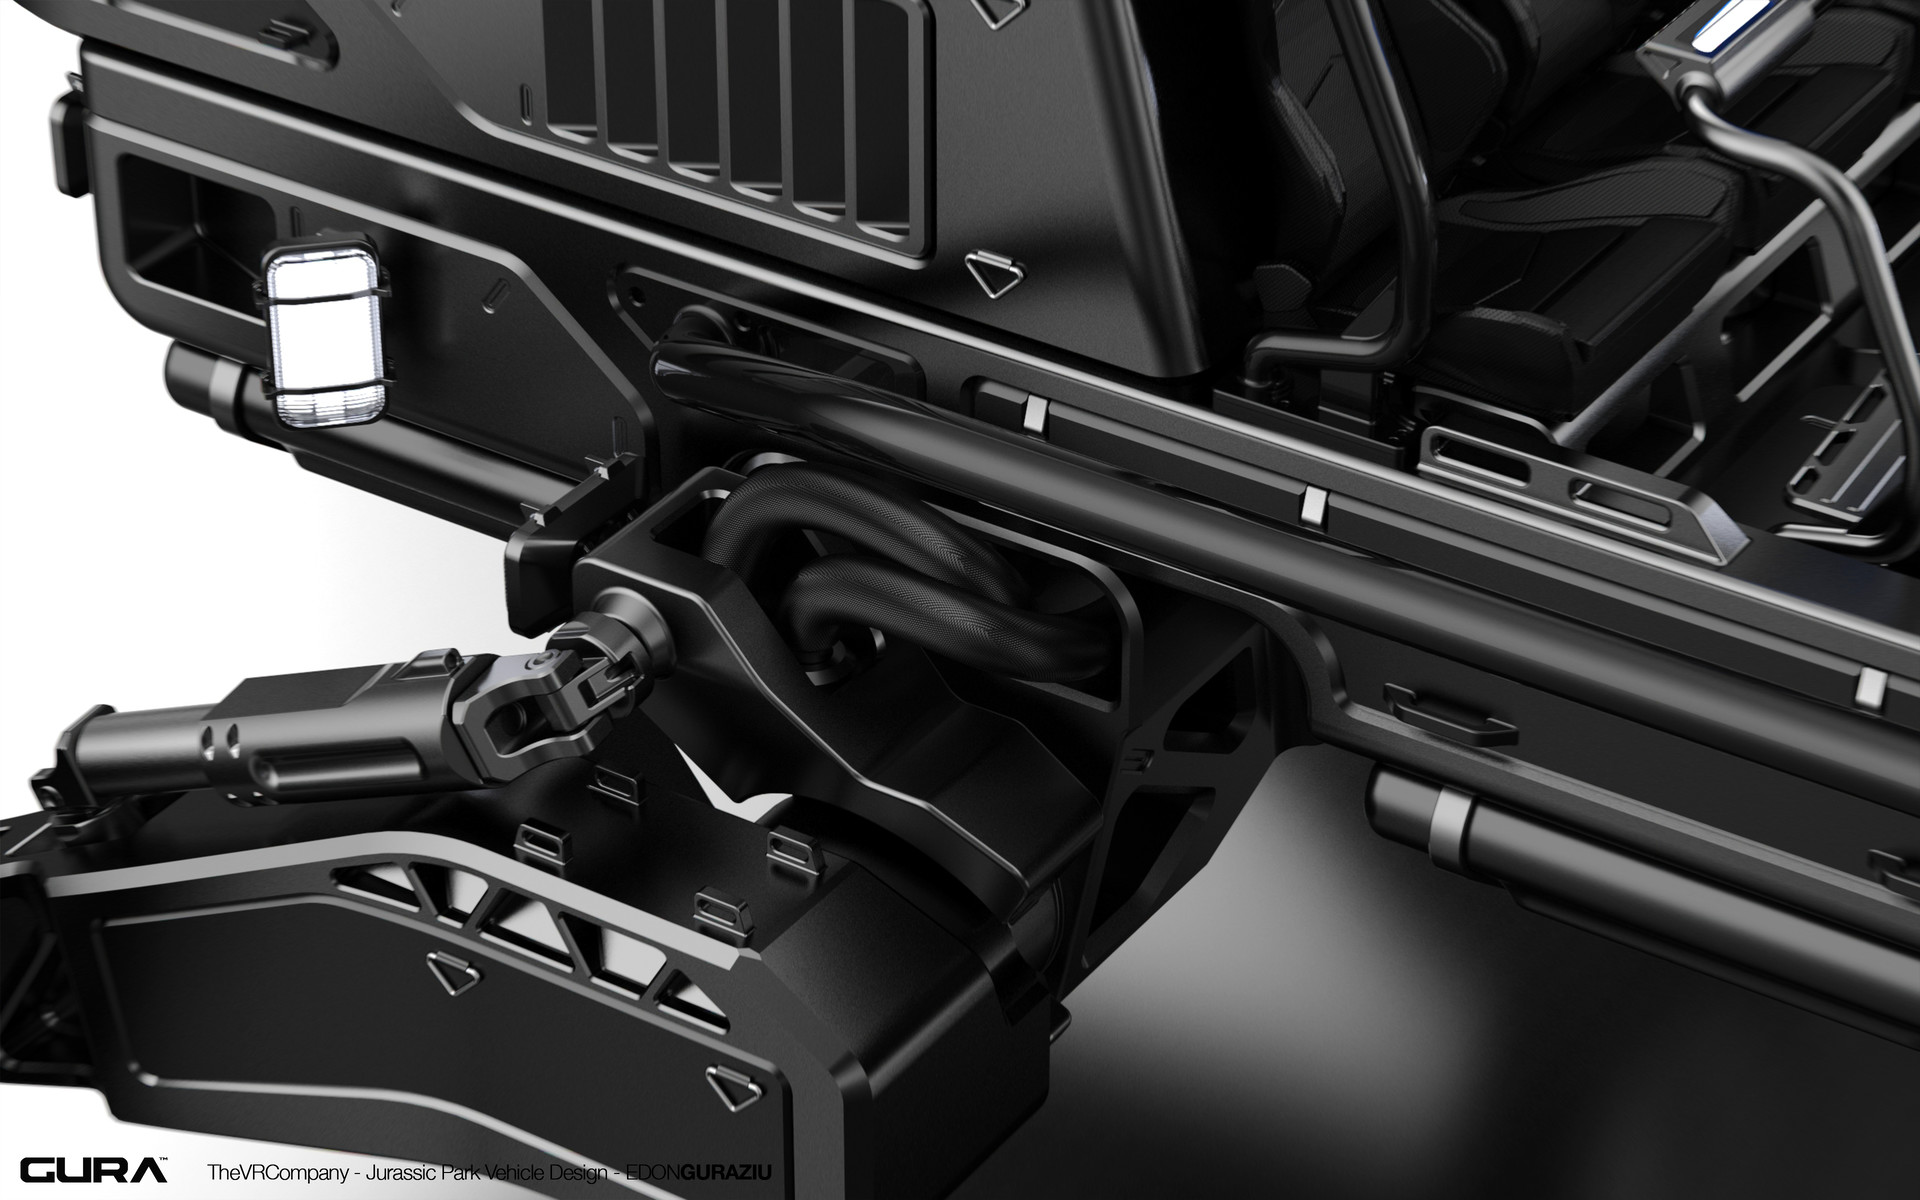 Edon guraziu vr vehicle design black 01